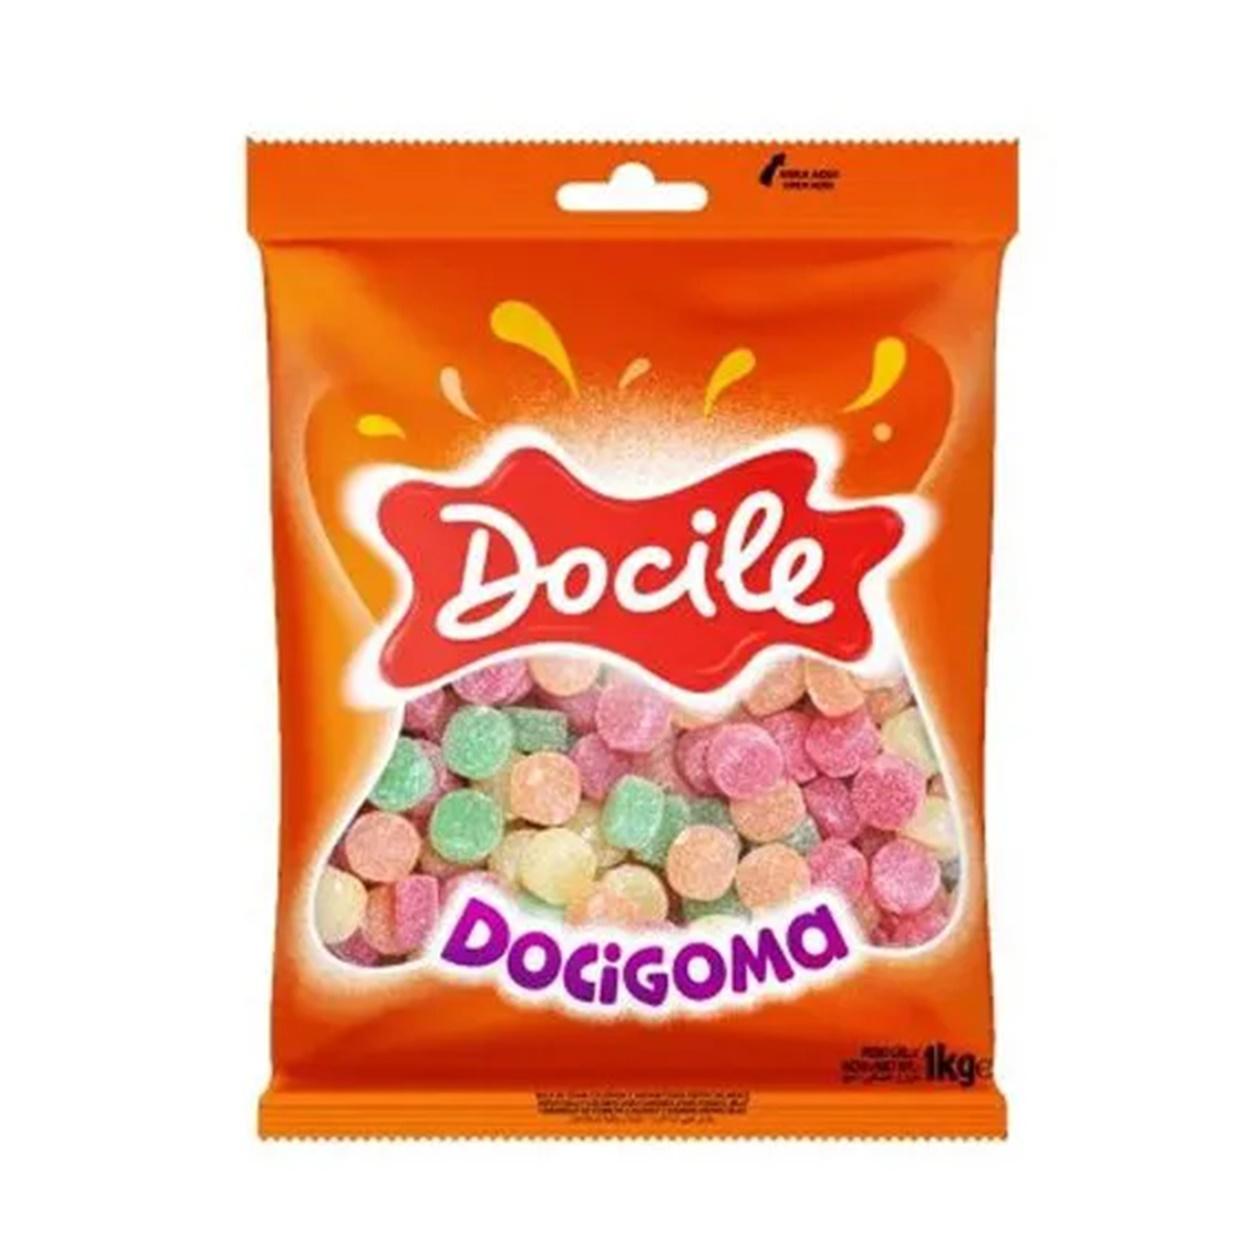 Bala De Goma Docigoma Sortida 1kg - Docile